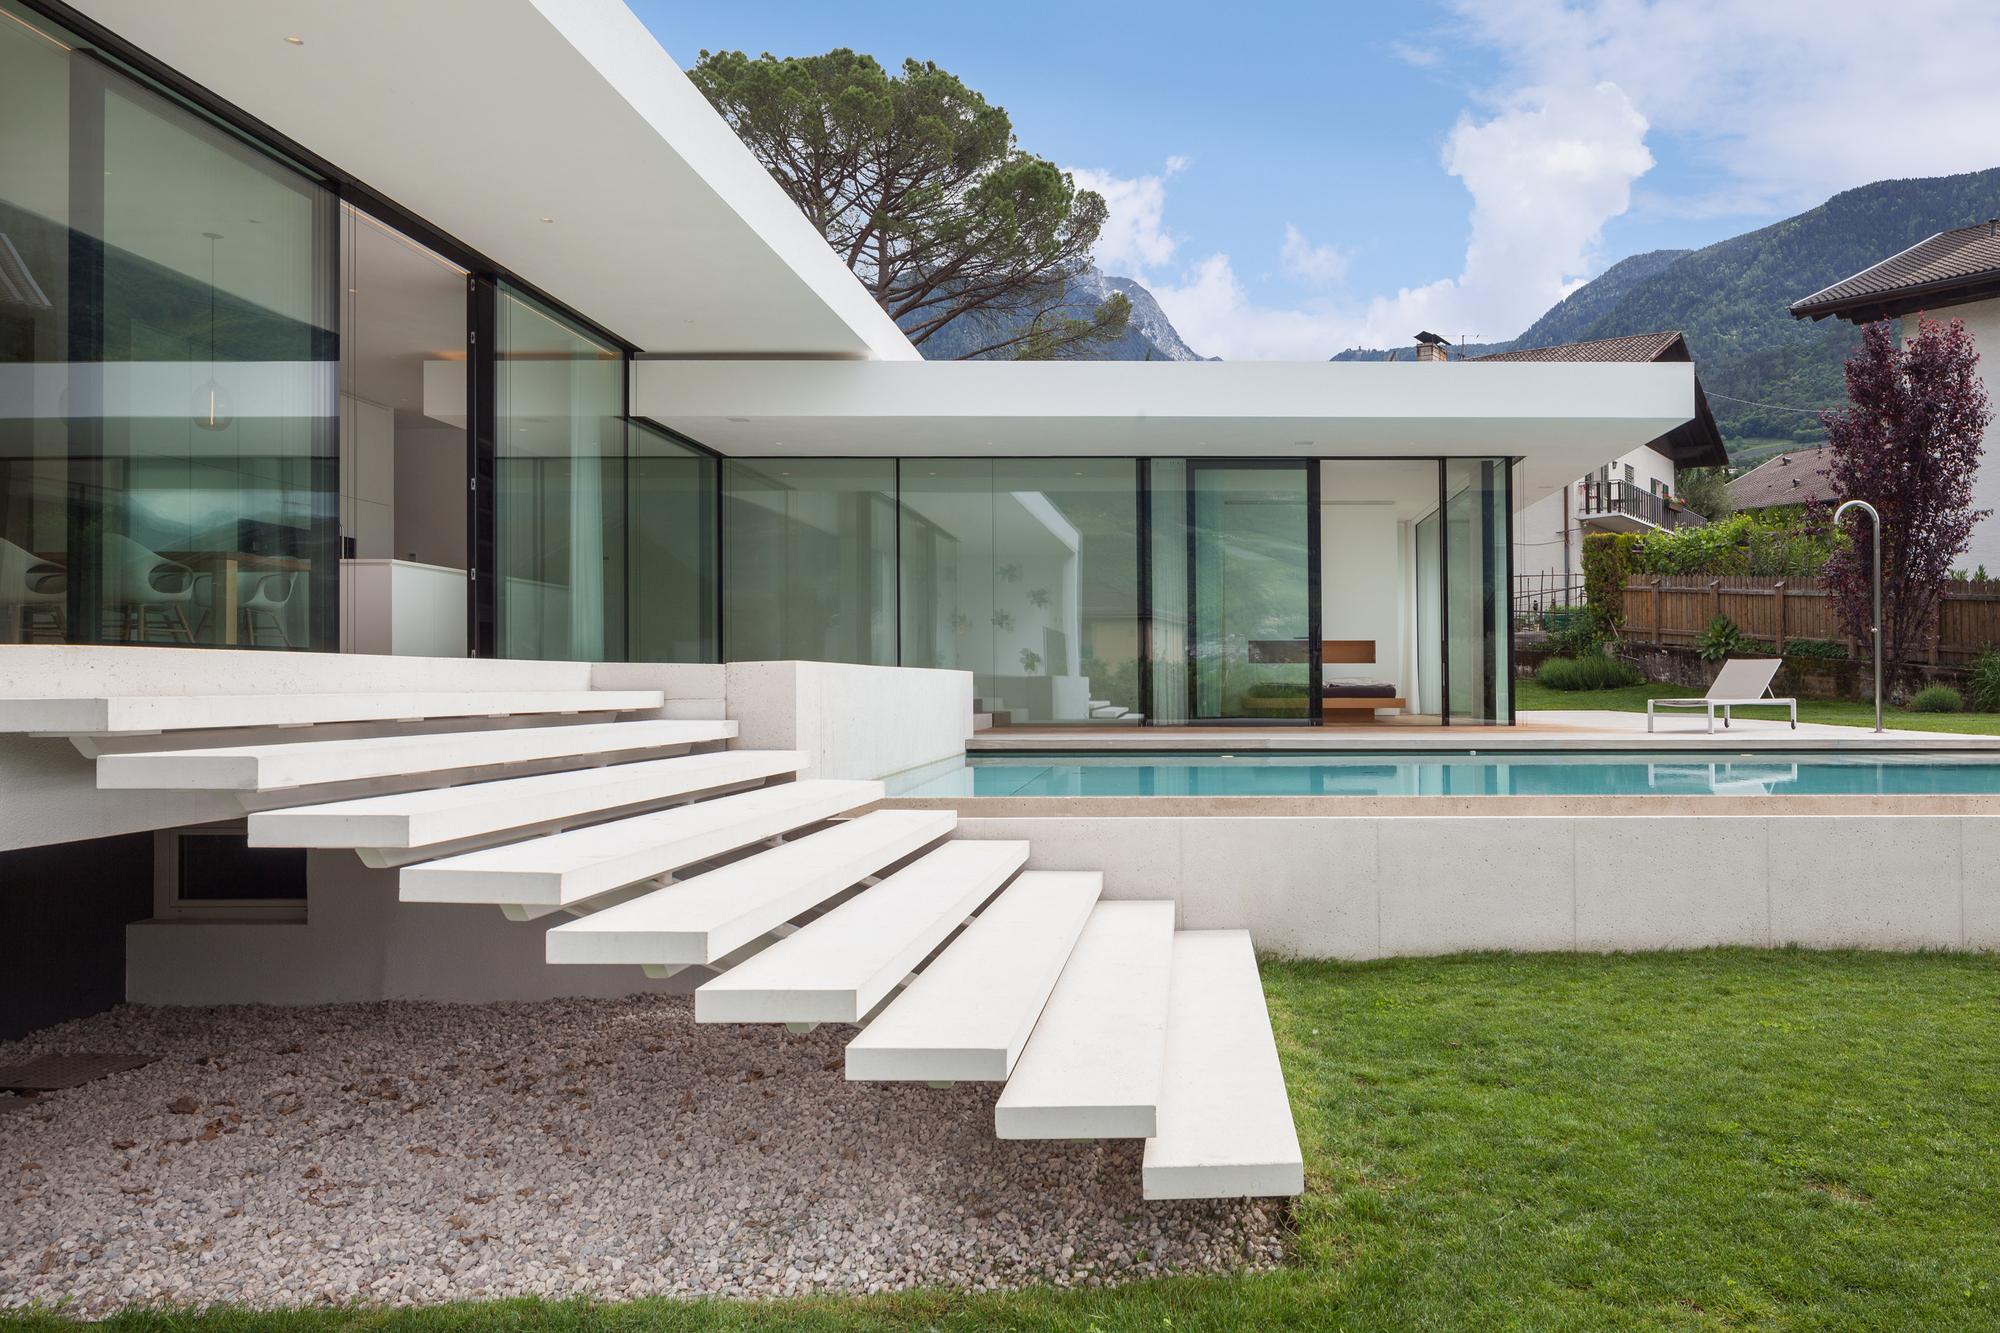 galer a de casa t monovolume architecture design 3. Black Bedroom Furniture Sets. Home Design Ideas